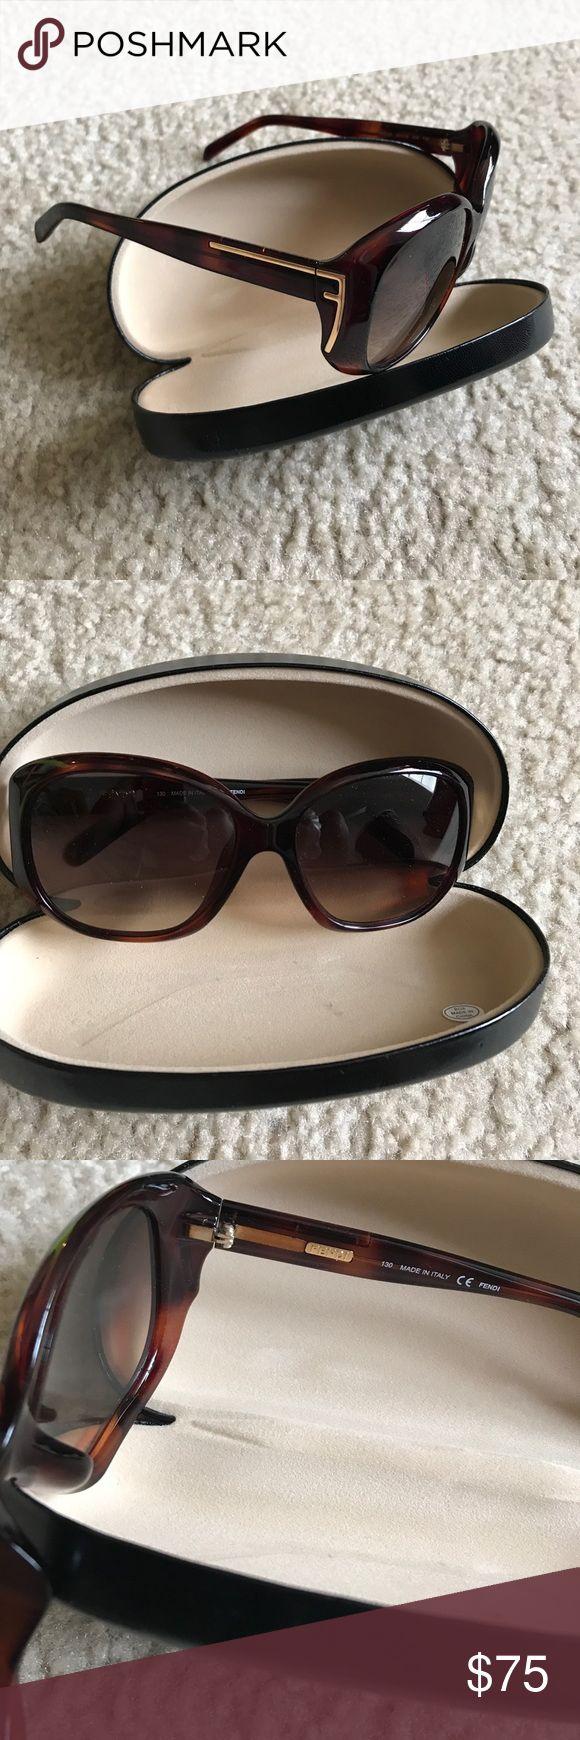 New Fendi Sunglasses Tortoise Brown Sunglasses. FYI: Neiman Marcus last call did not send the original case with the sunglasses. Fendi Accessories Sunglasses